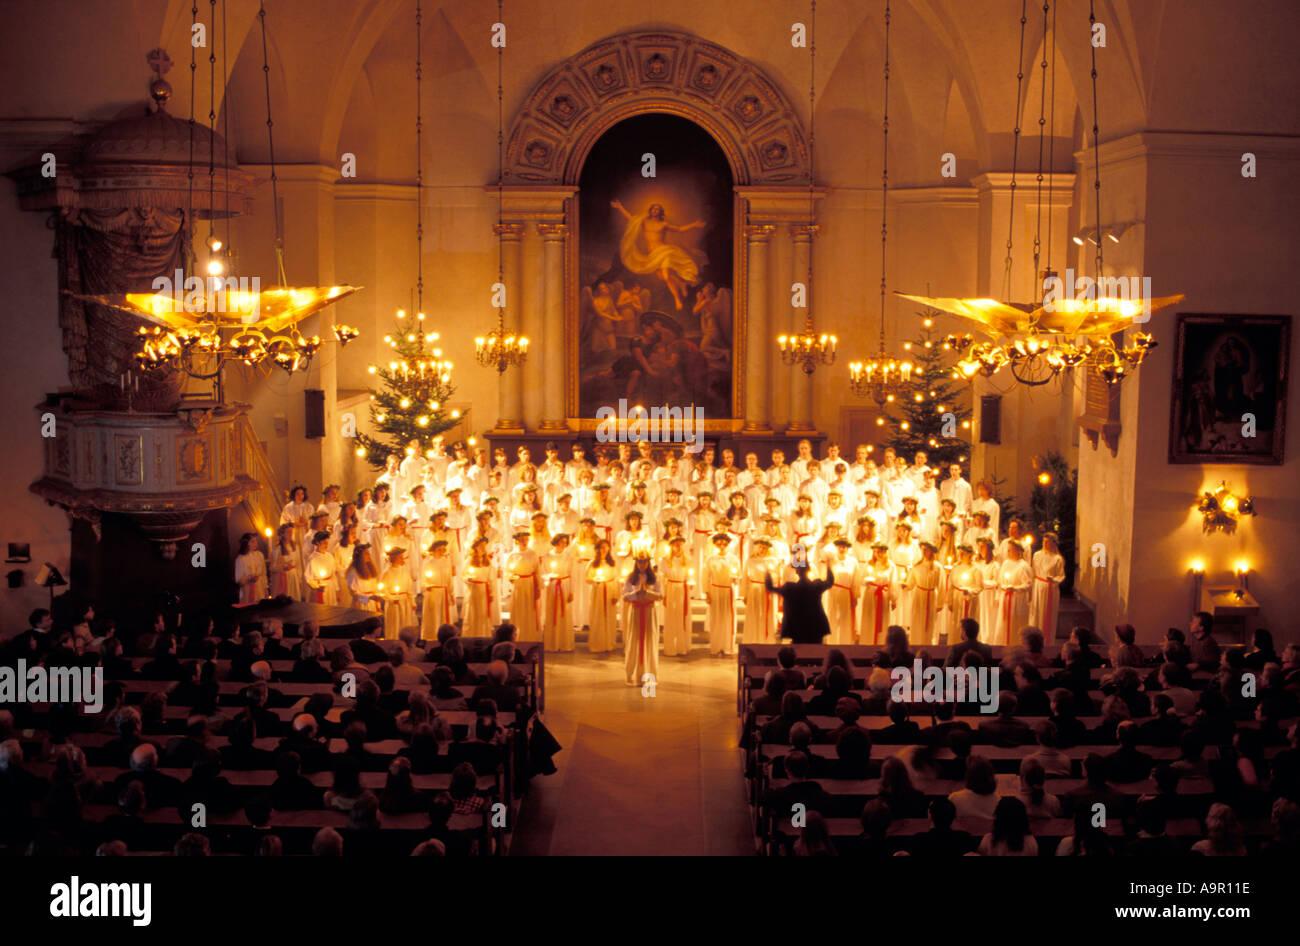 Children's choir at Kungsholmen Church in Stockholm on Santa Lucia Day December 13 - Stock Image